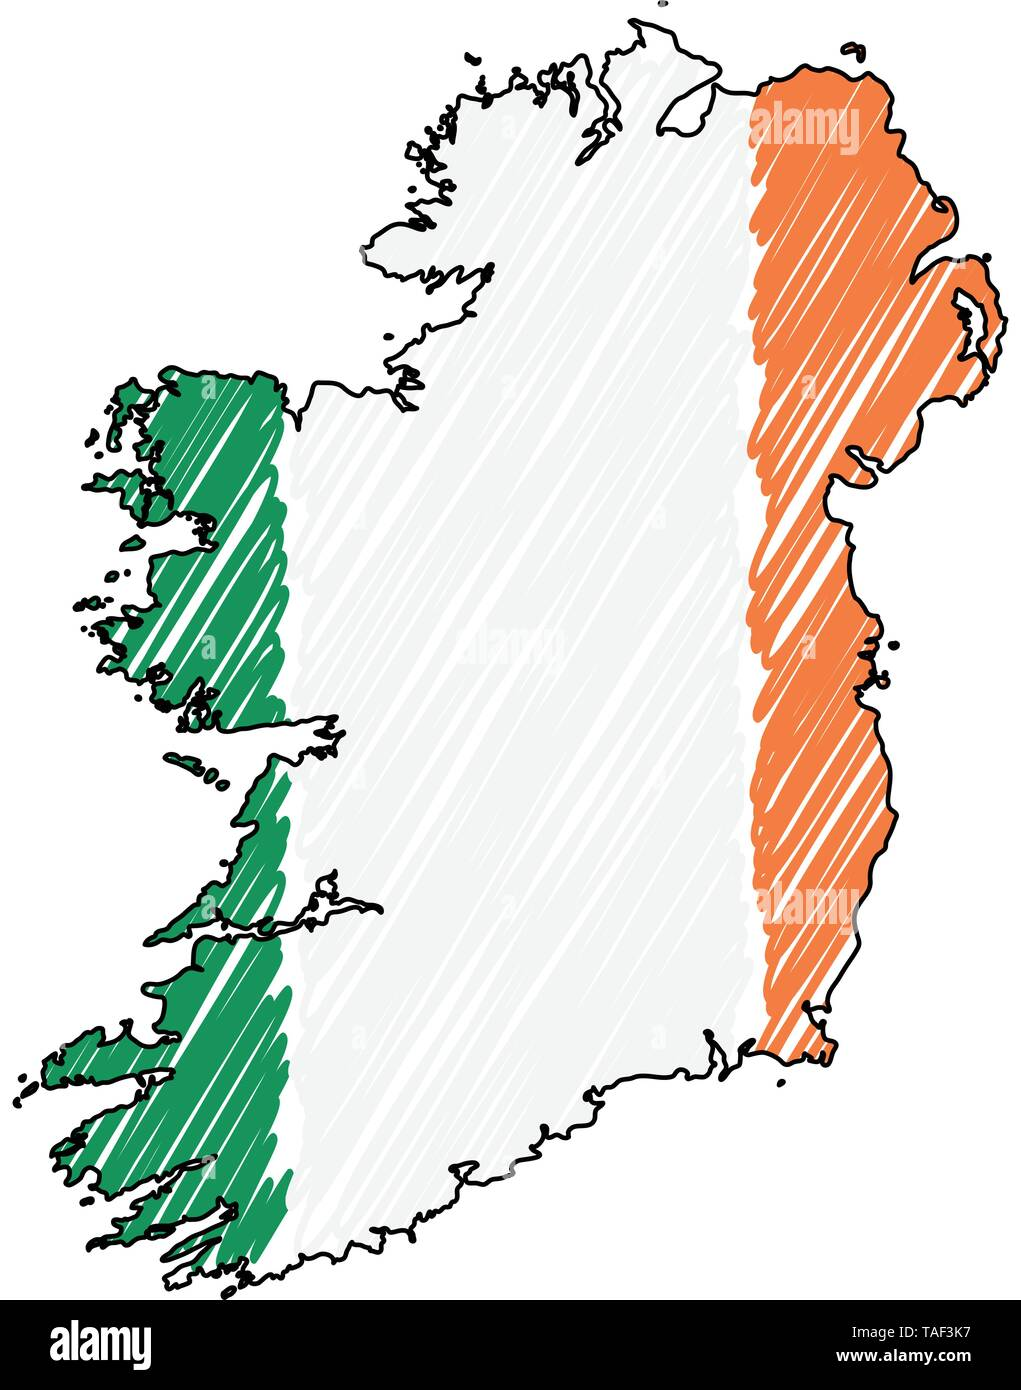 Map Of Ireland Drawing.Map Ireland Drawing Stock Photos Map Ireland Drawing Stock